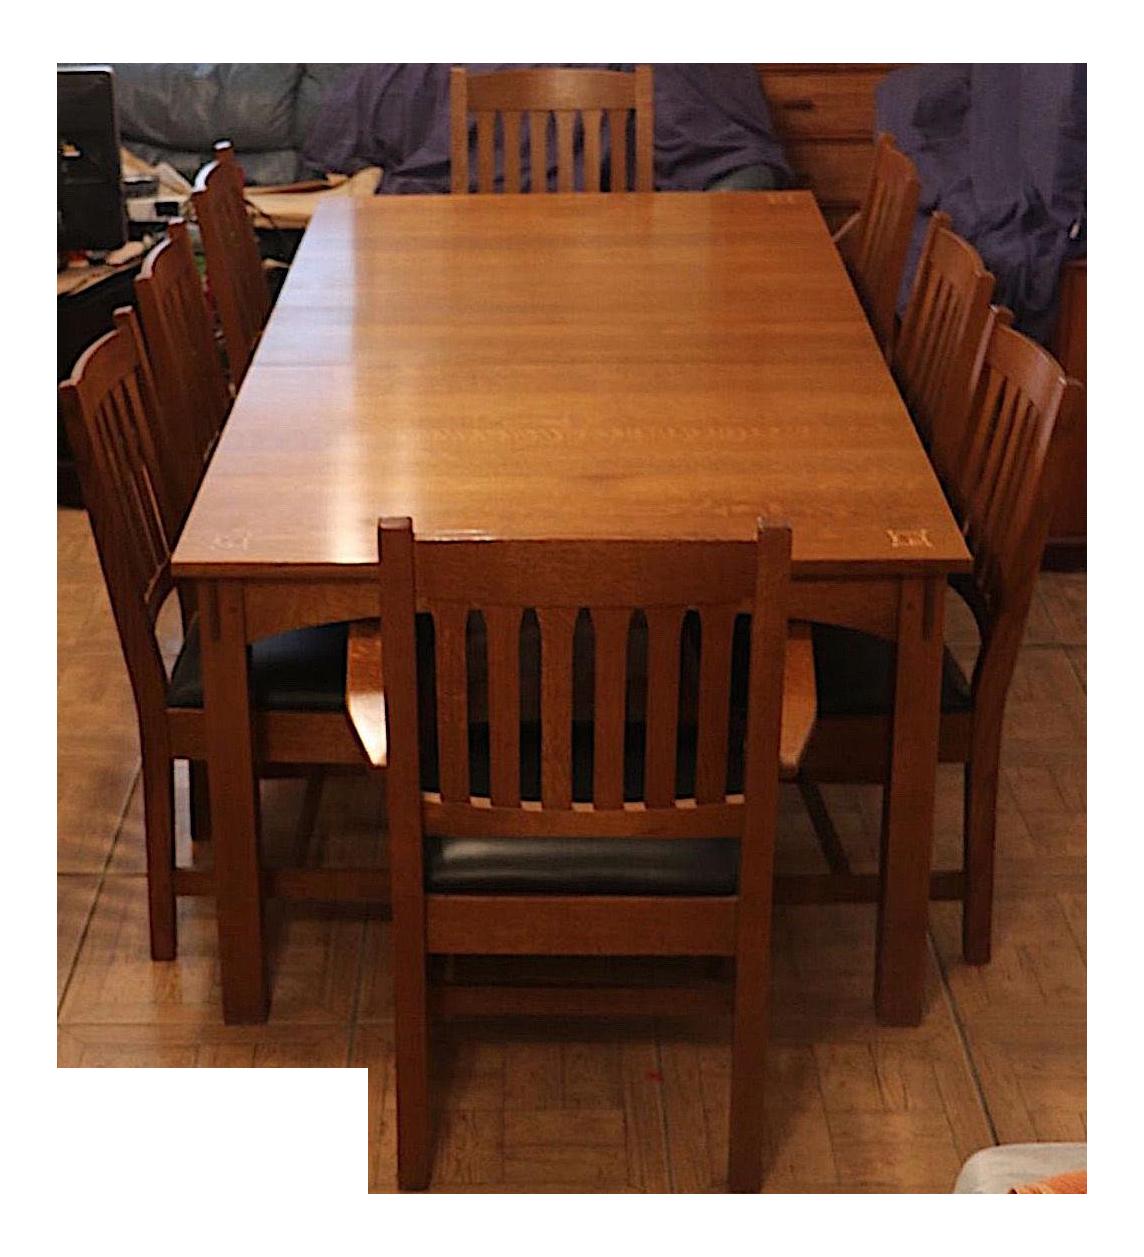 Venta Used Stickley Dining Table En, Used Stickley Dining Room Furniture